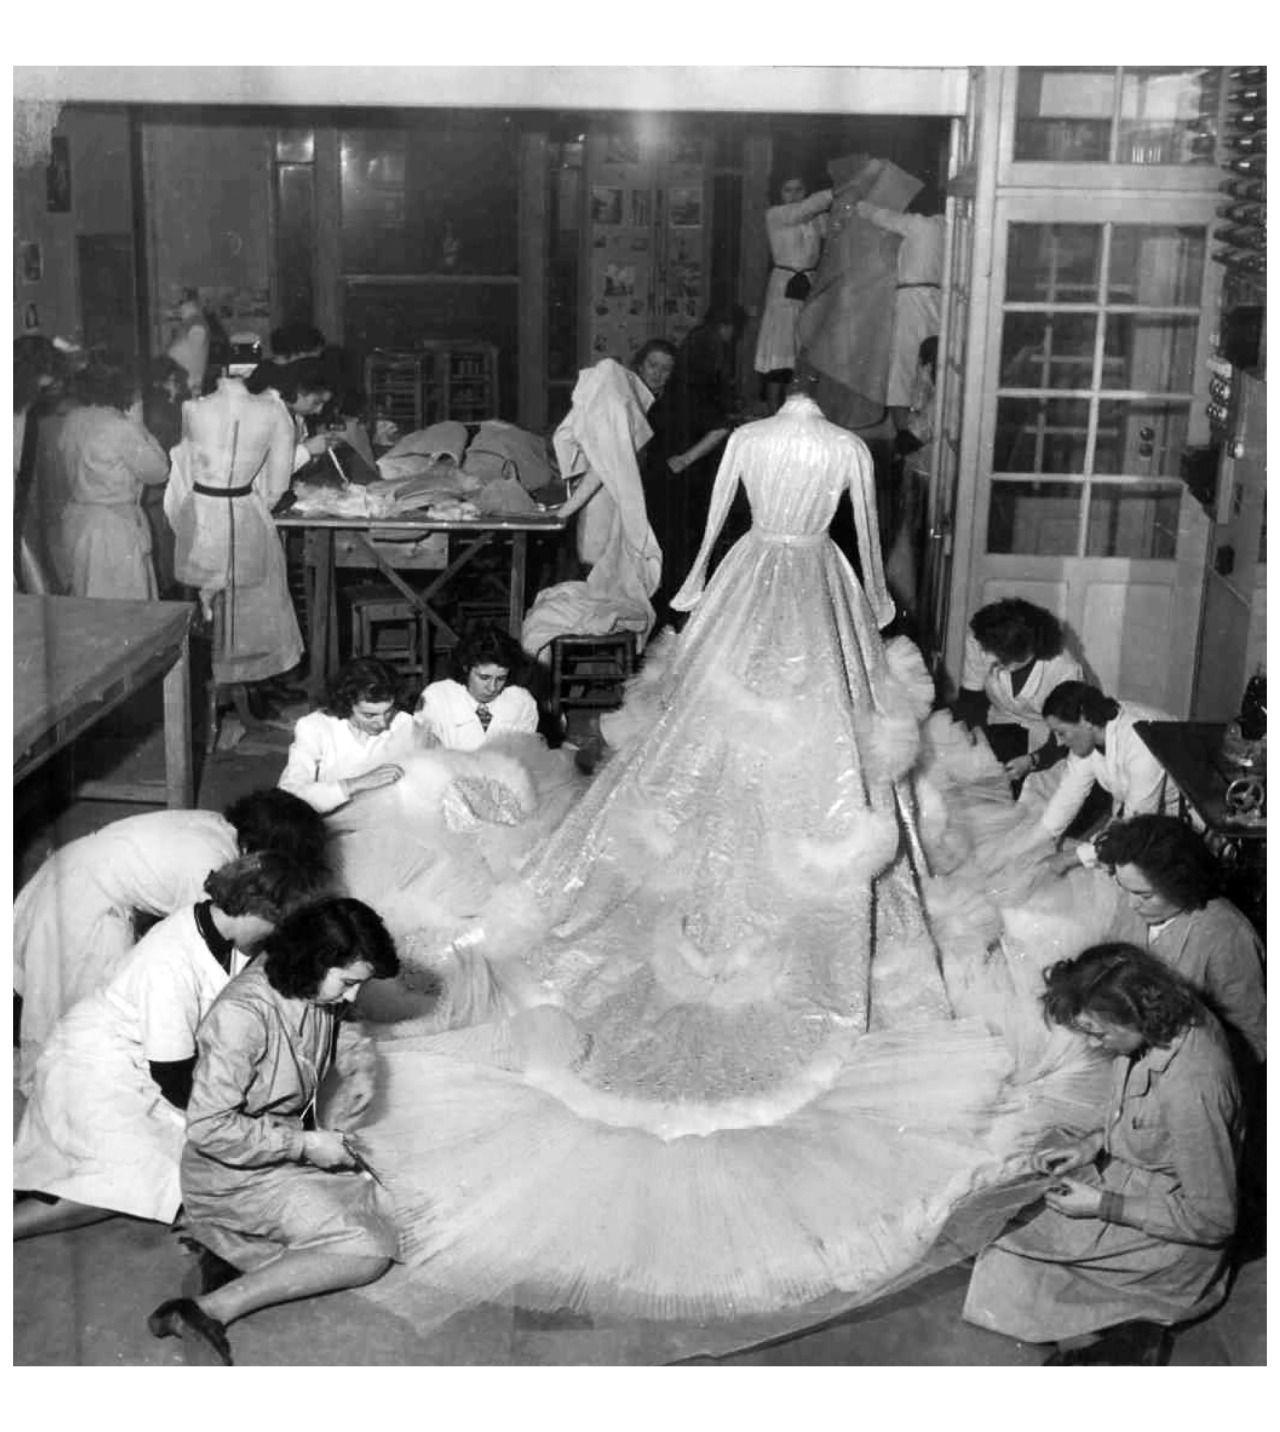 Dior wedding dresses  Catherinettesud of the Maison Christian Dior finishing the Wedding